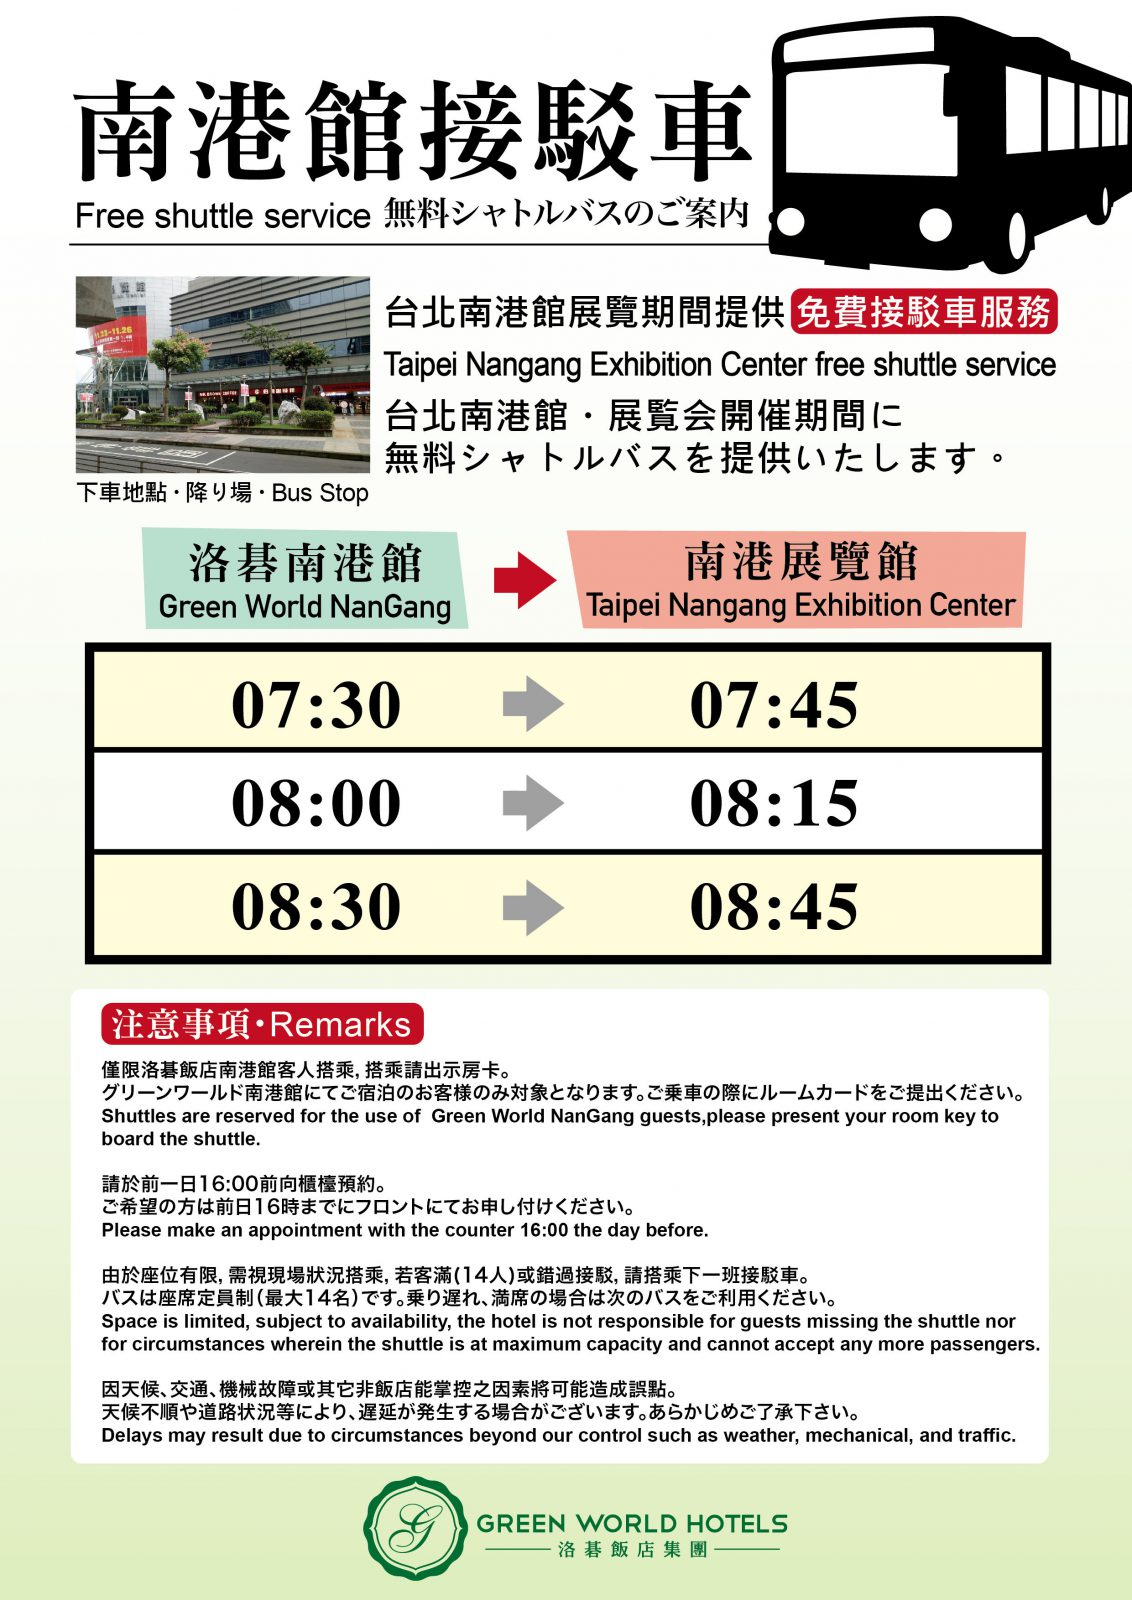 Free Shuttle Service Official Green World Hotels